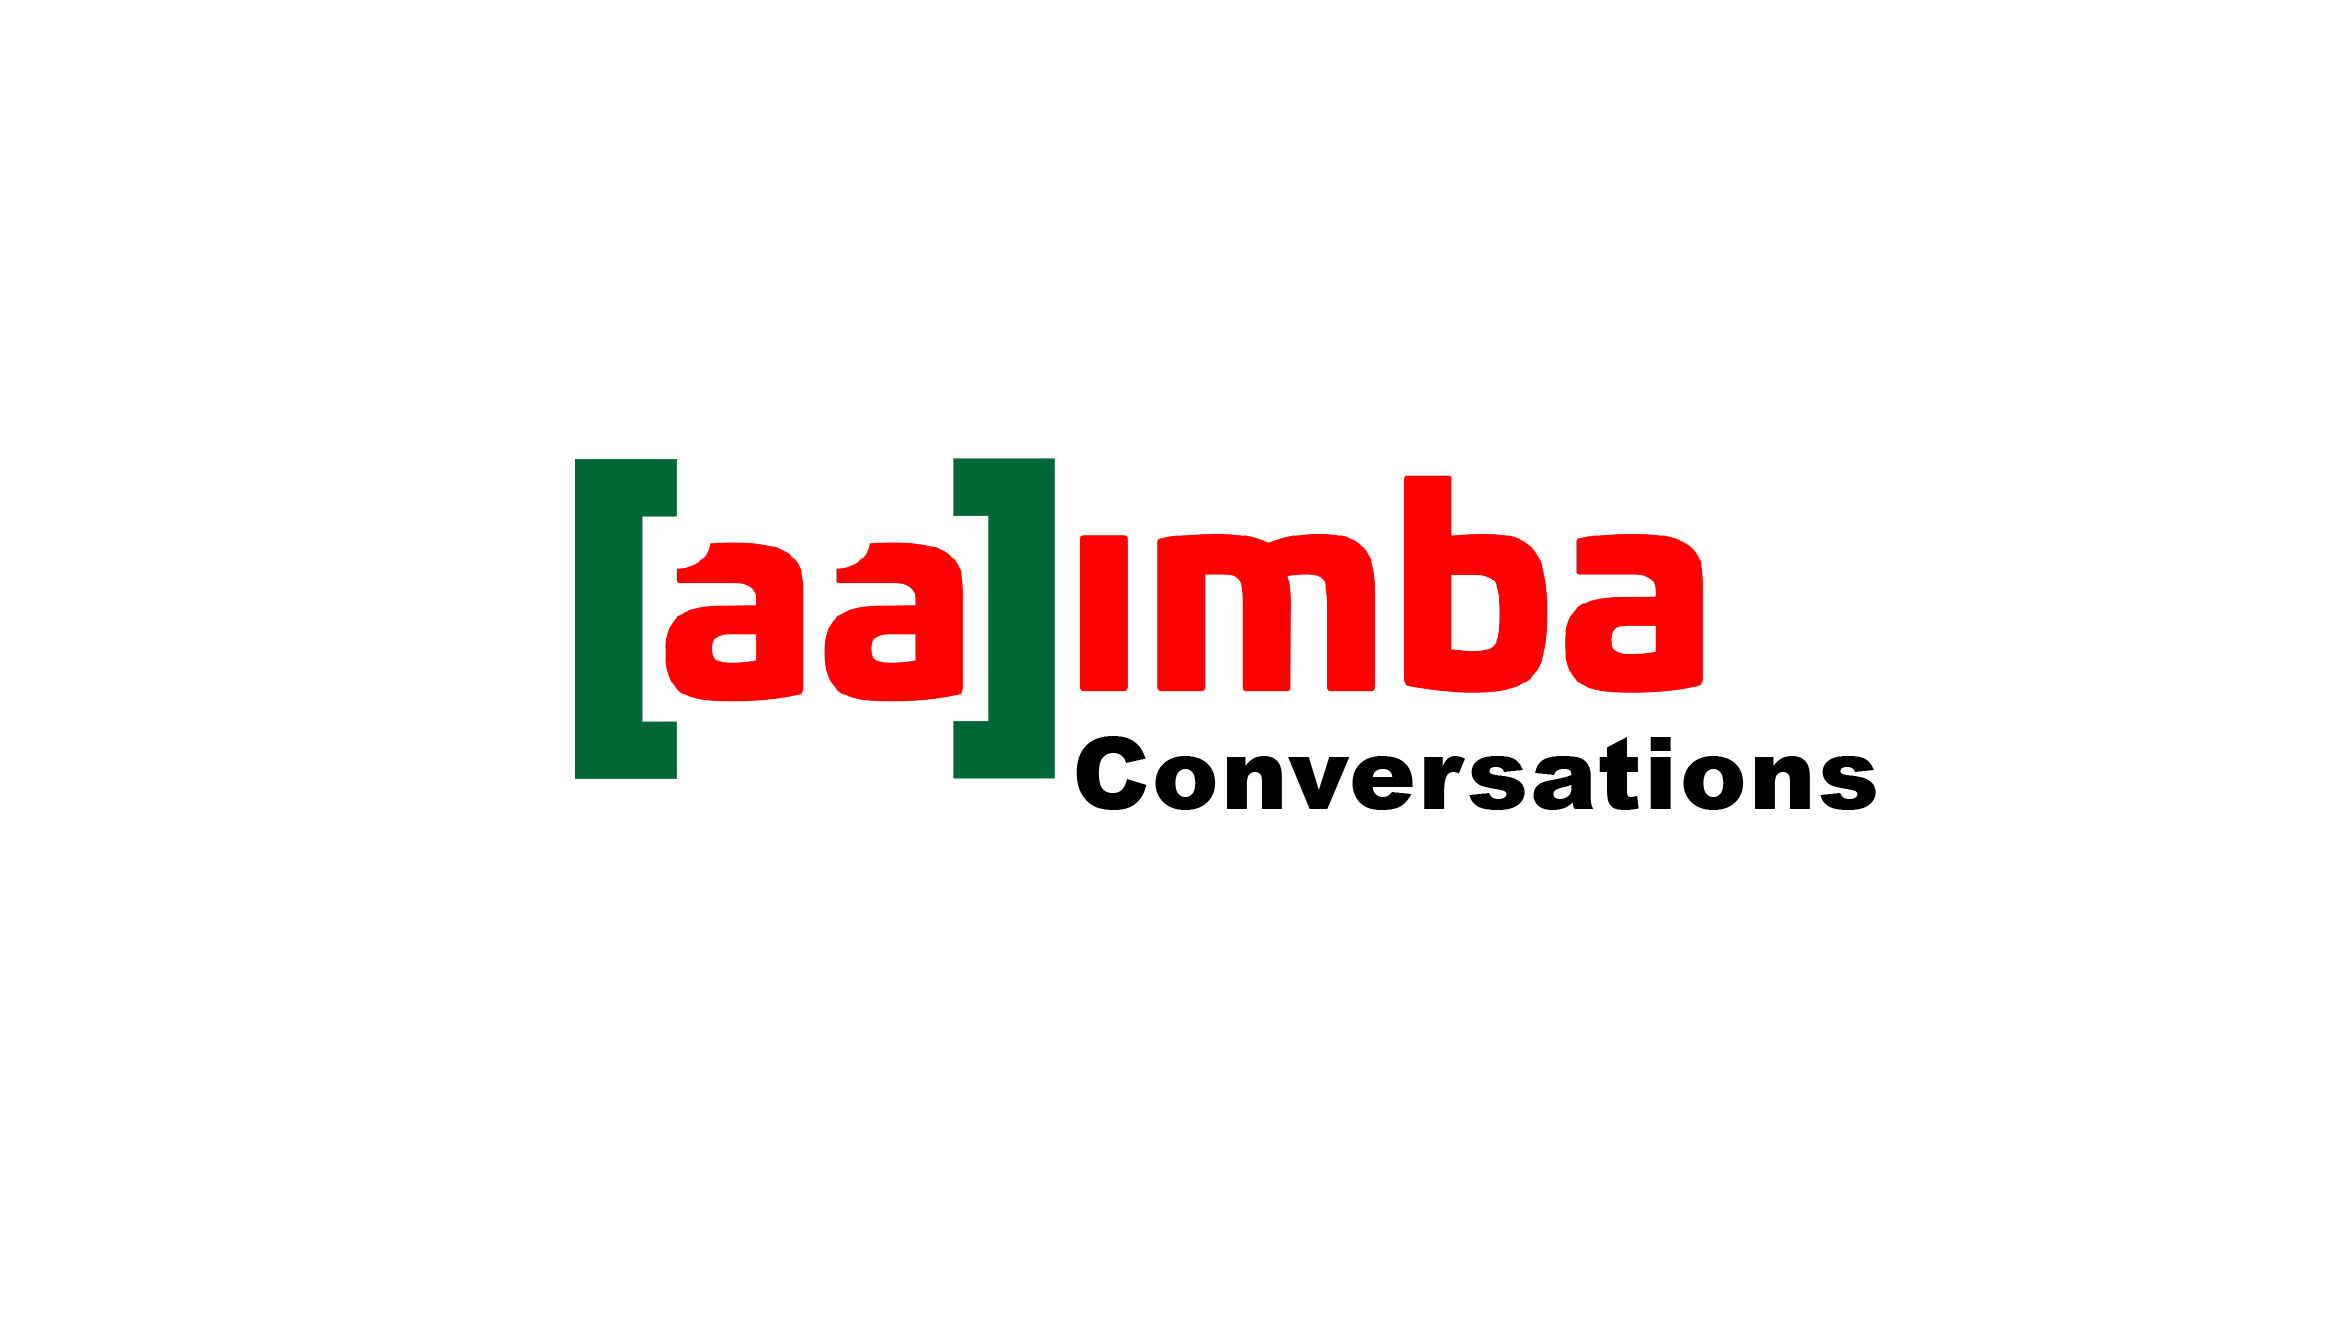 [aa]imba Conversations